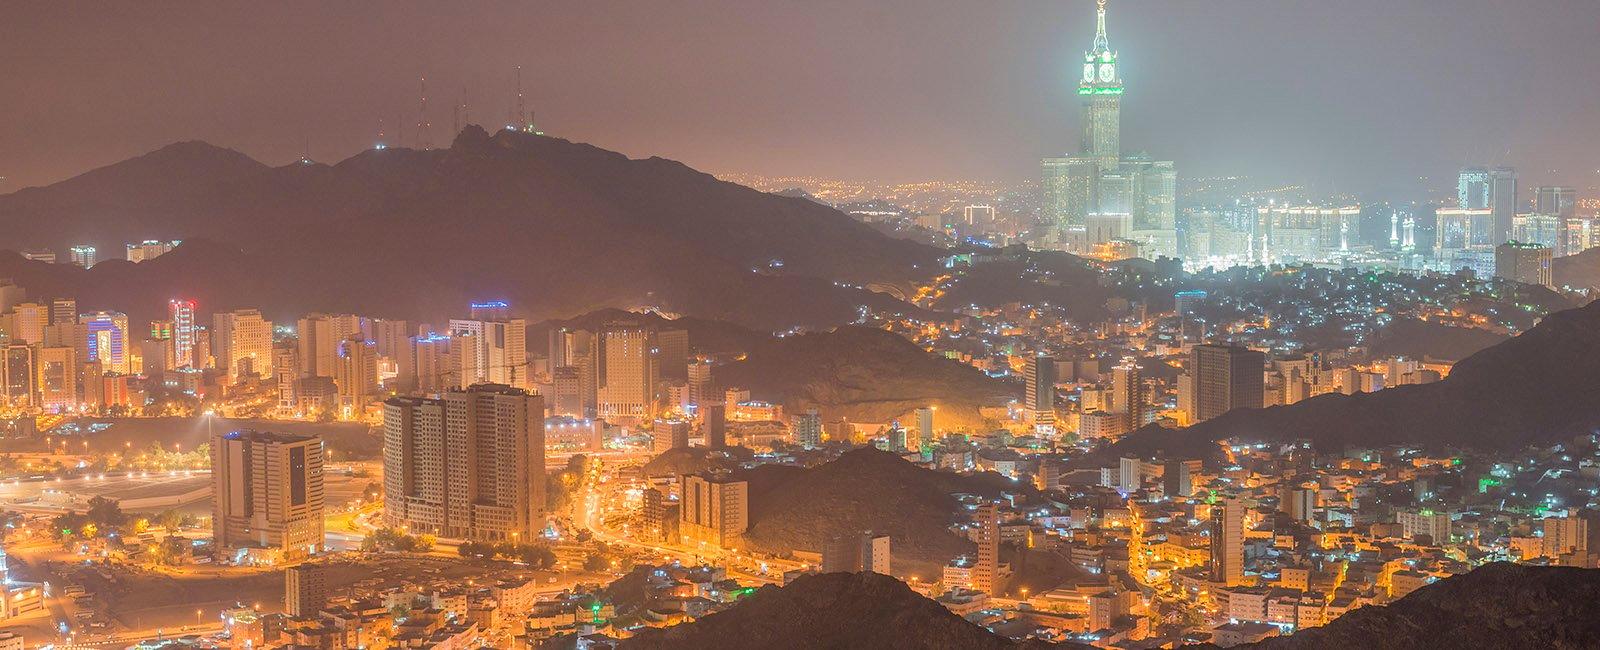 View of Mecca City in Saudi Arabia